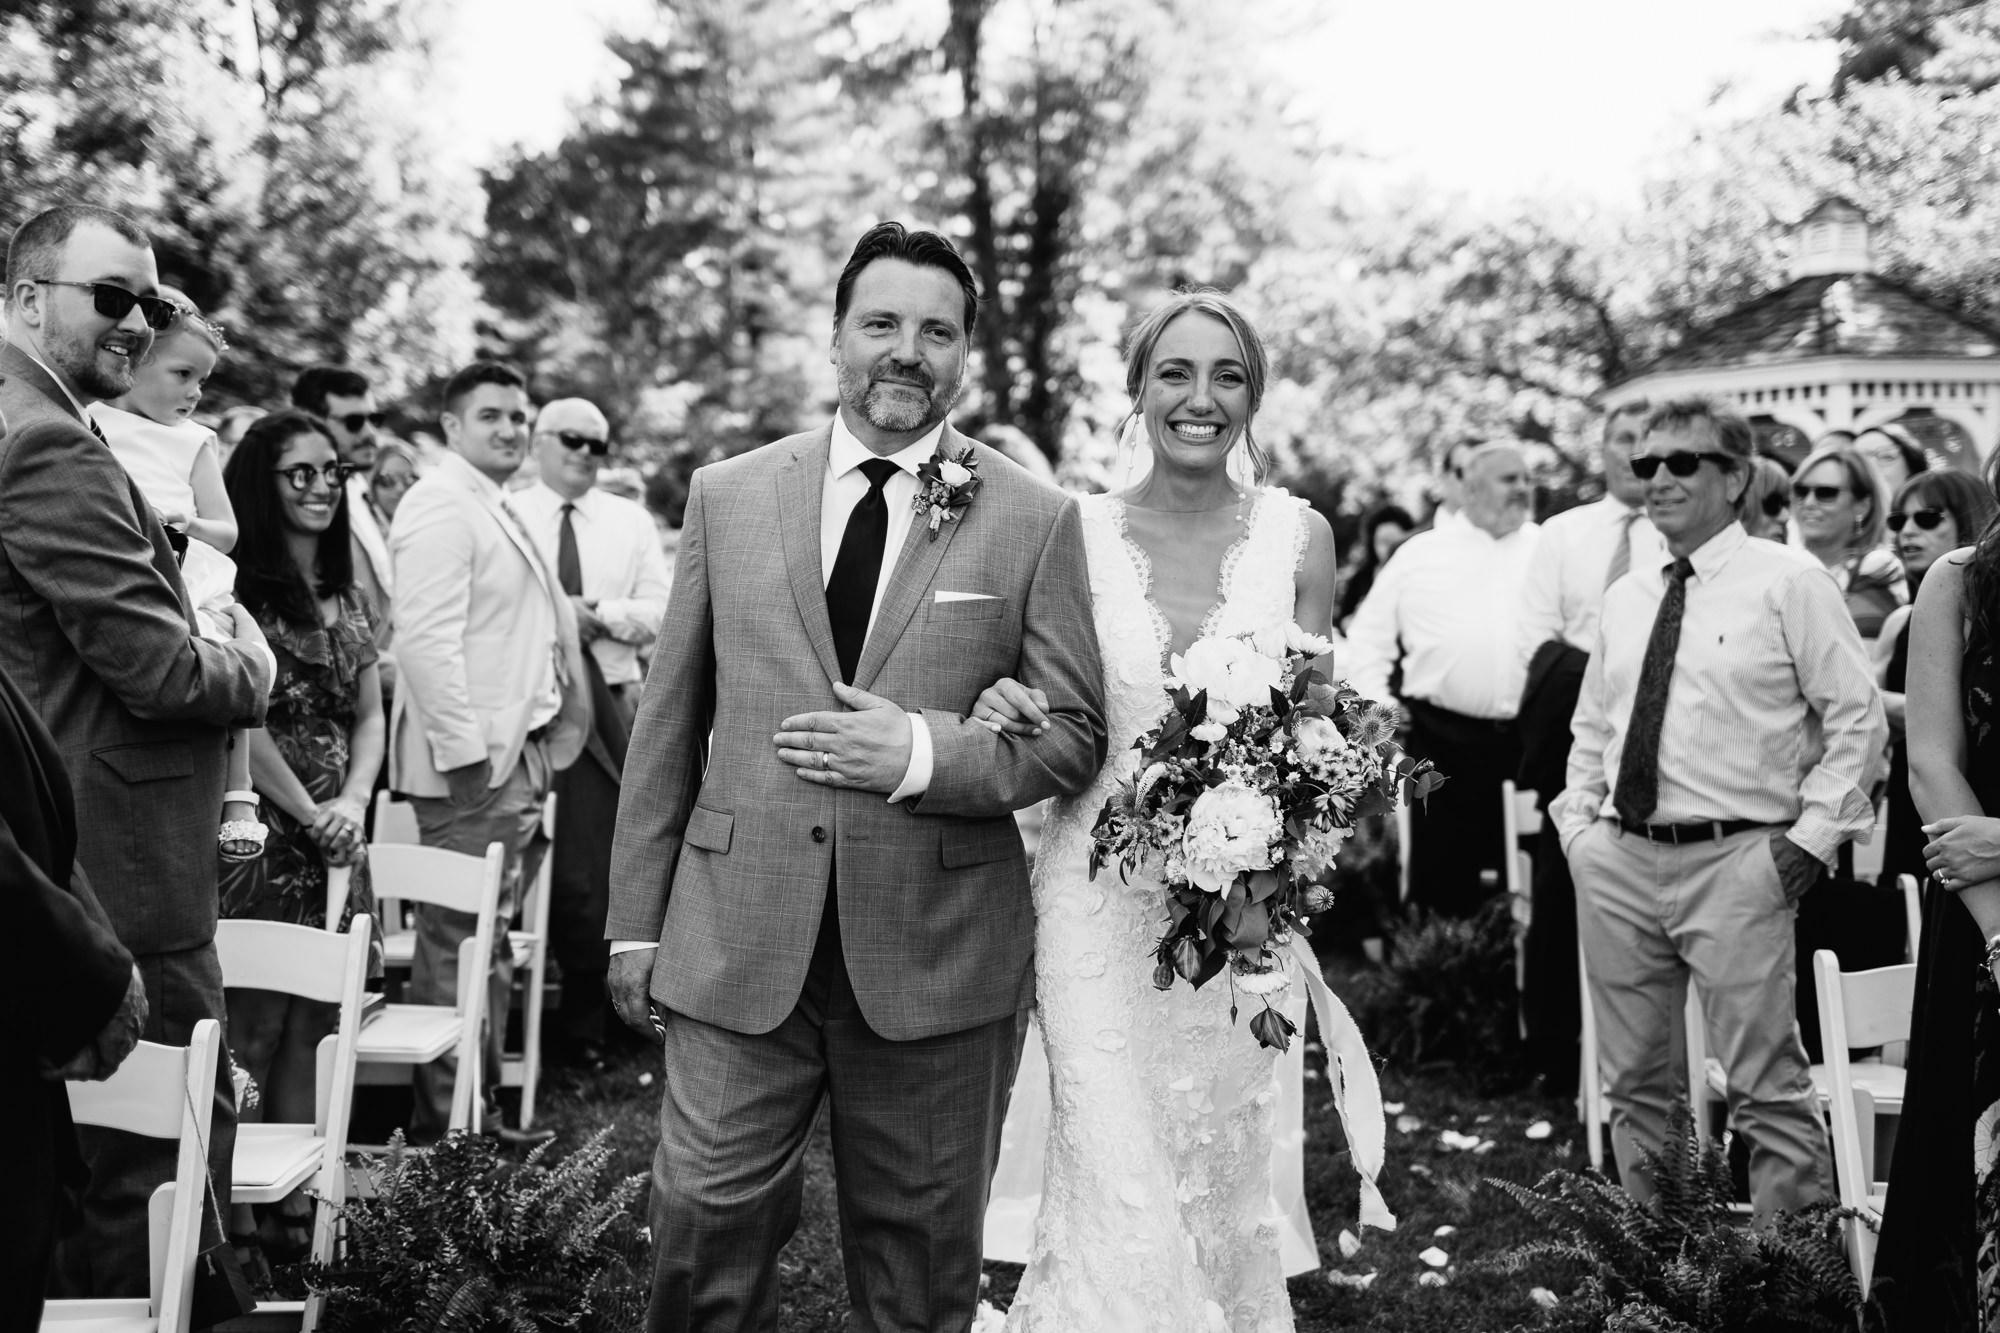 connecticut-summer-lake-wedding-emily-kirke-photography-upstyle (88 of 181).jpg